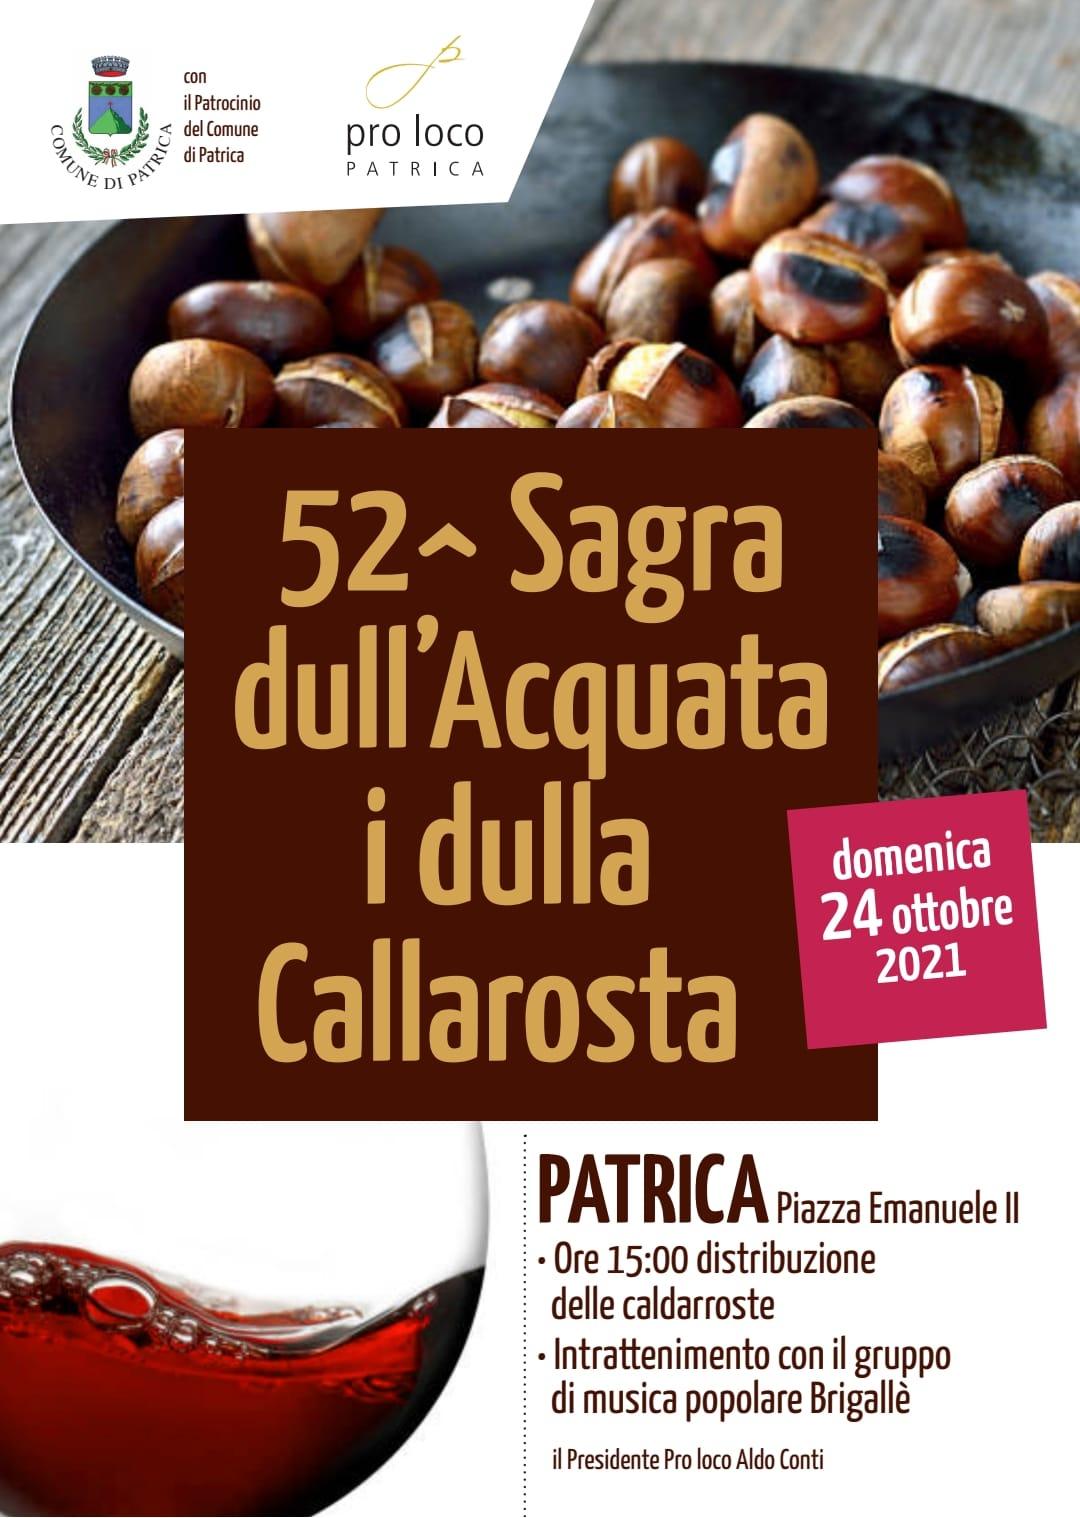 Patrica: 52°Sagra dull'Acquata i dulla Callarosta @ Patrica